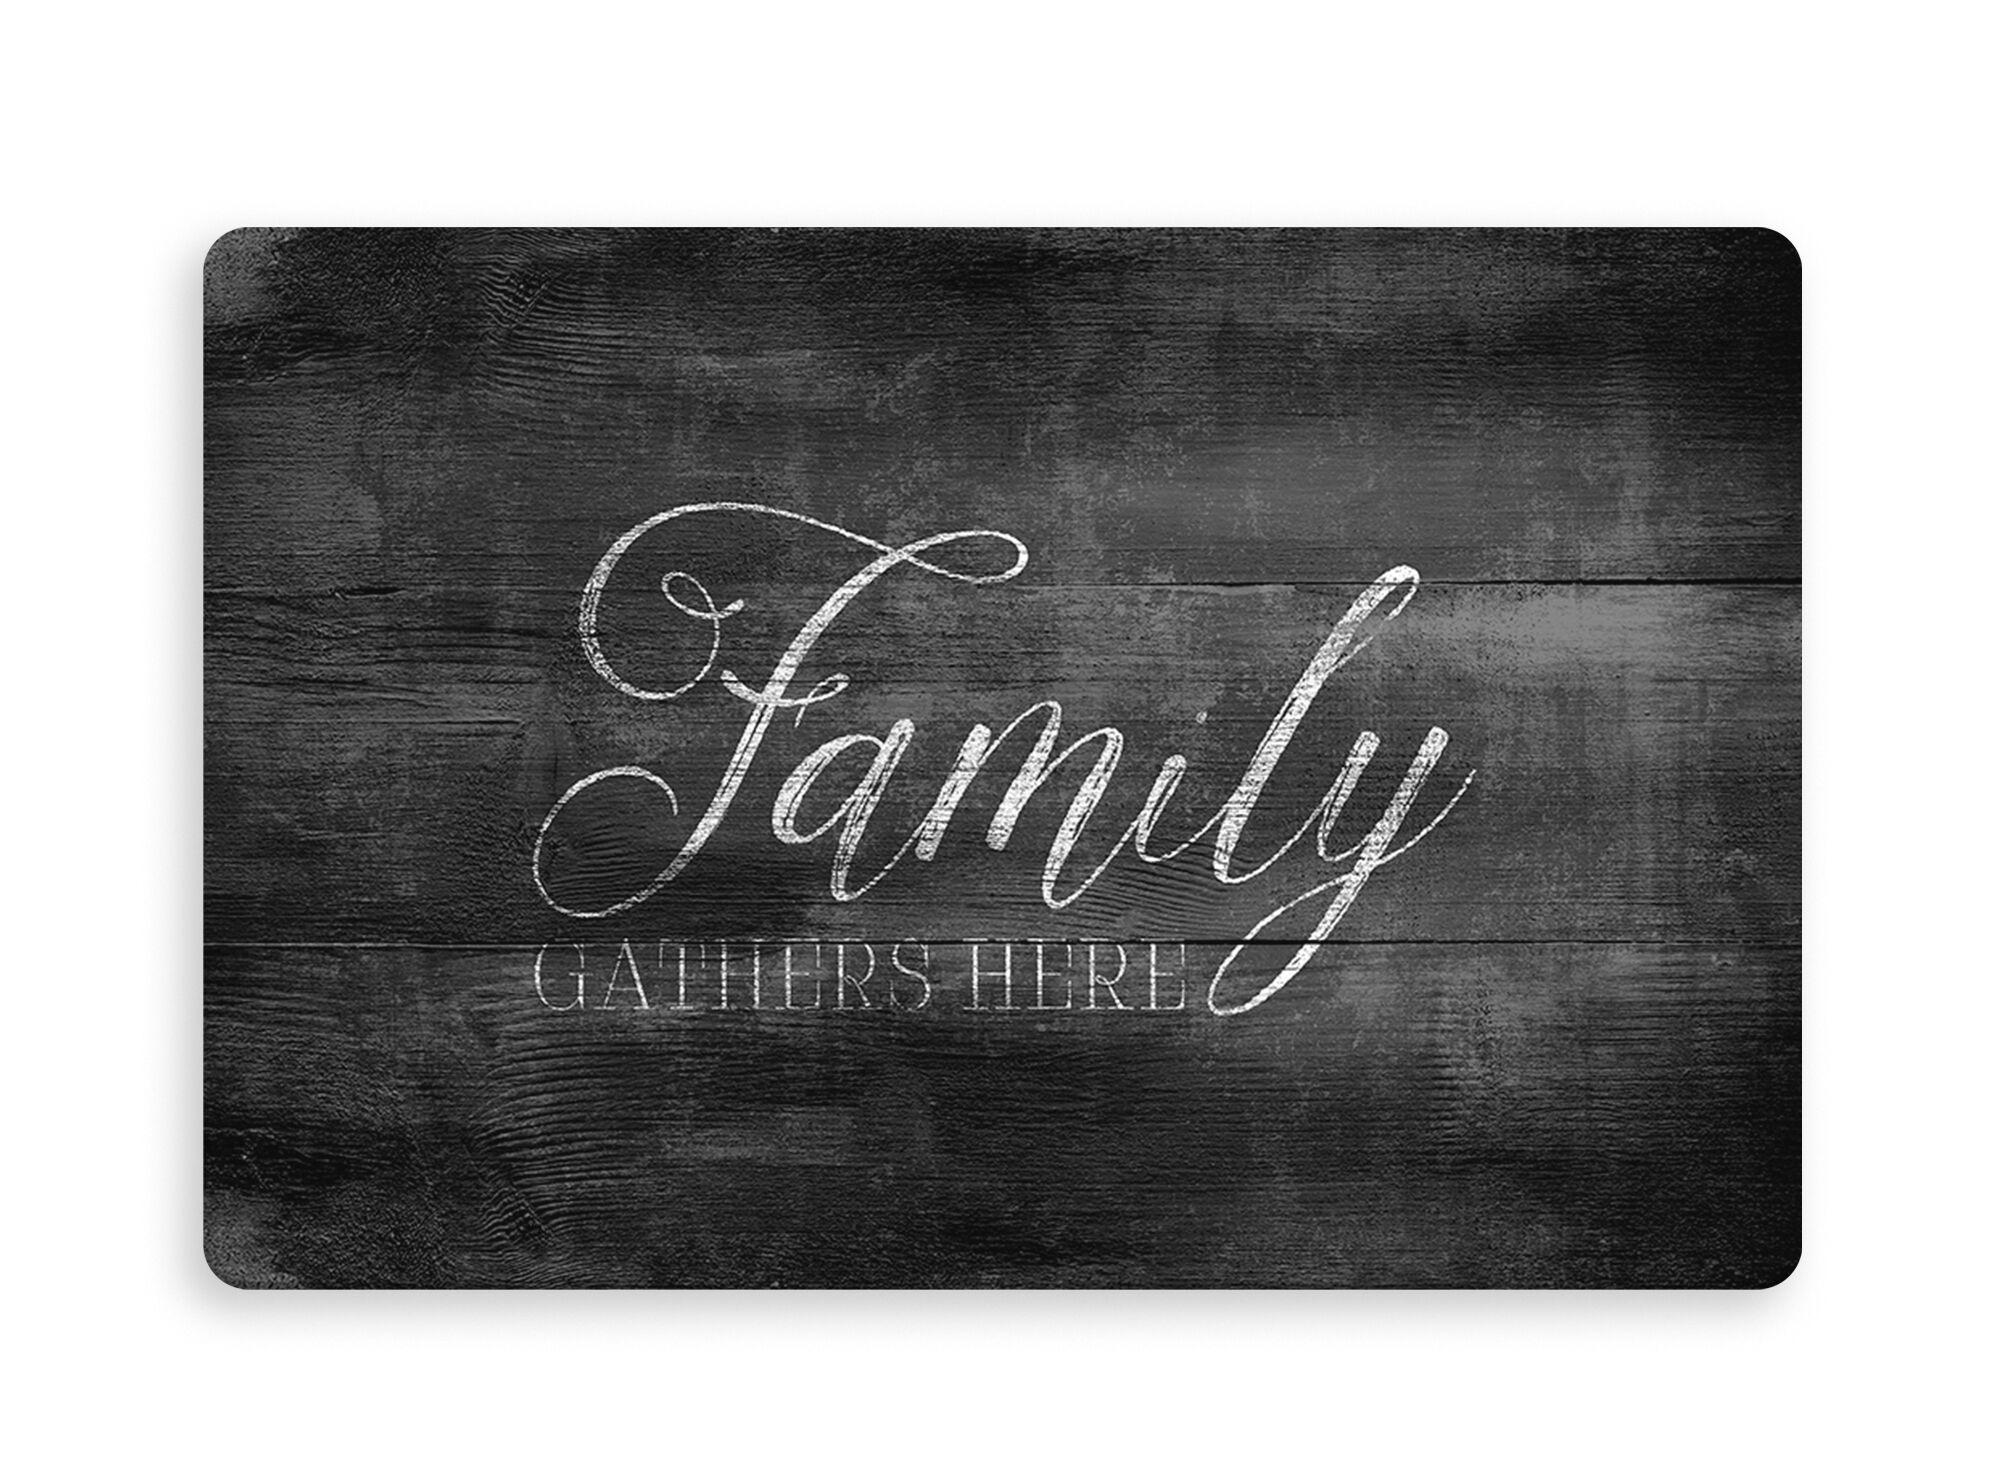 Taraji Family Gathers Here Kitchen Mat Mat Size: Rectangle 2'6